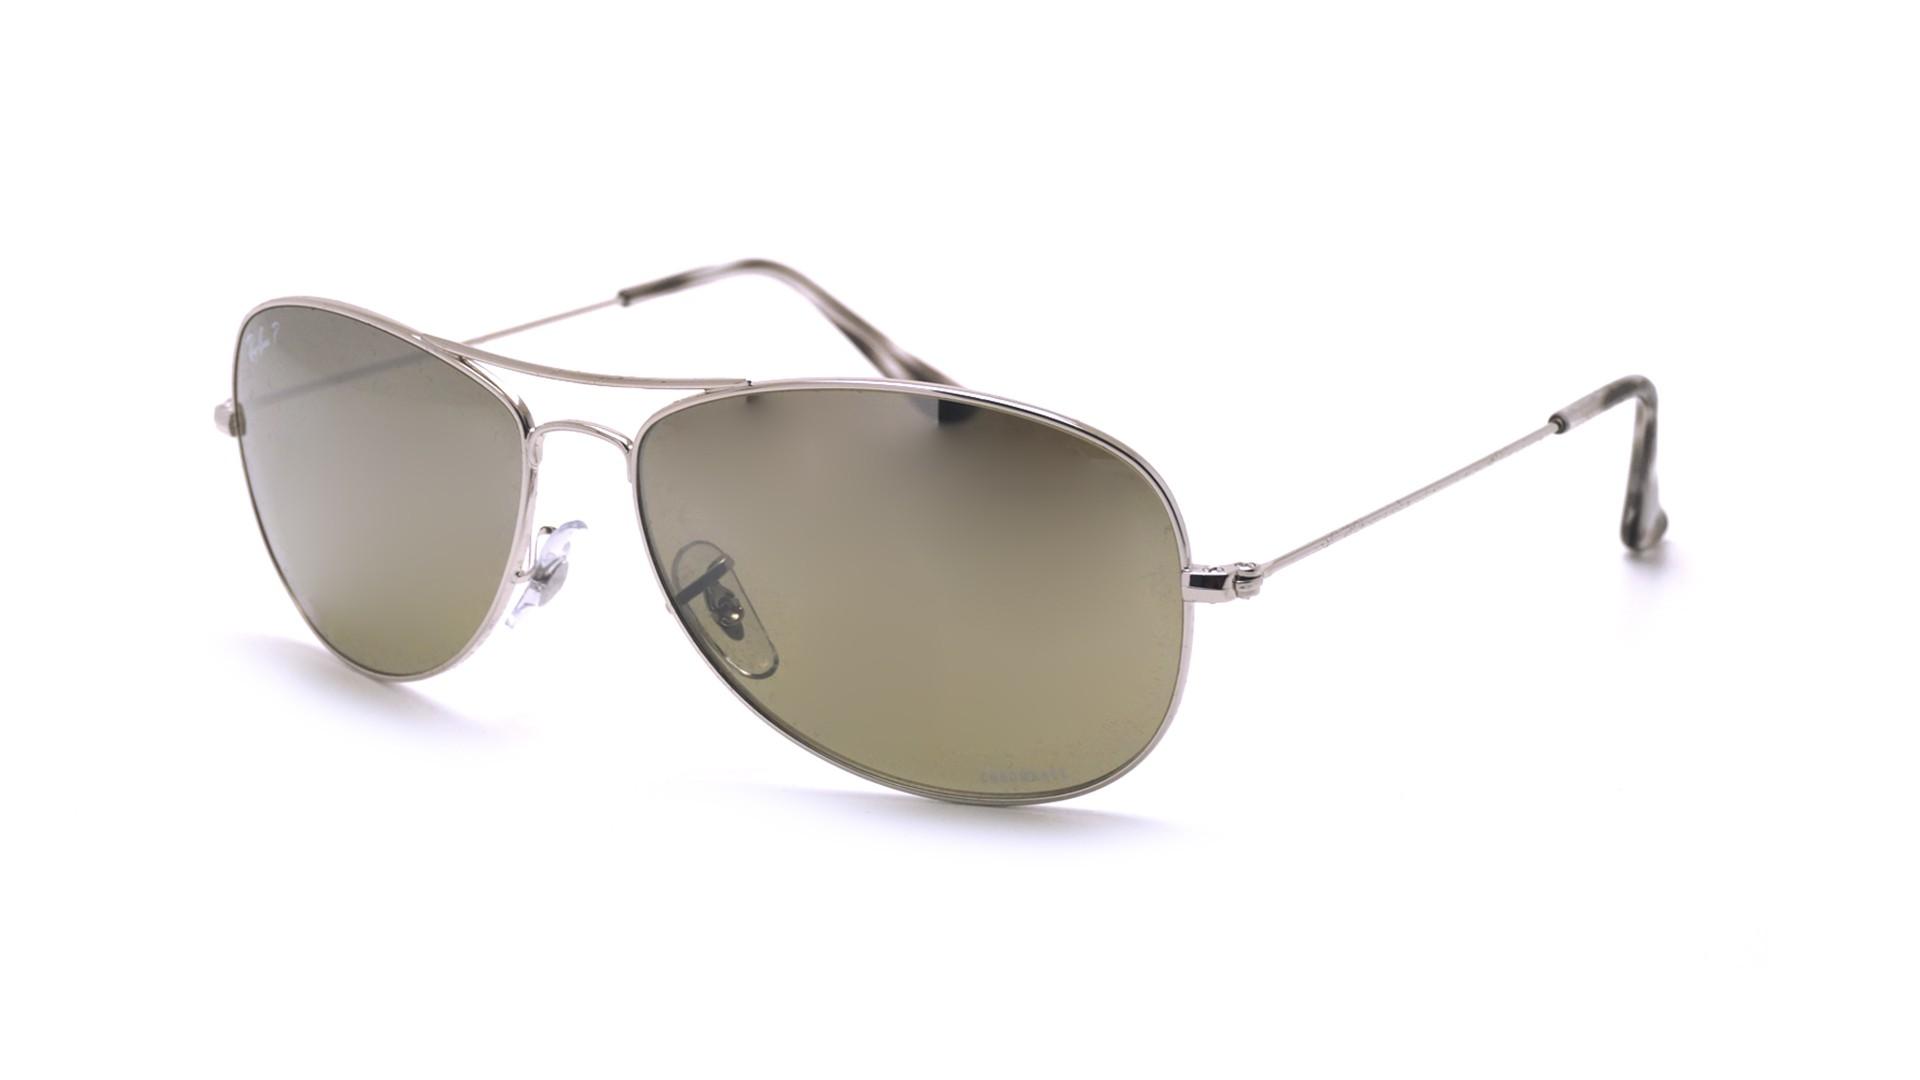 4e6bb52cf95 Sunglasses Ray-Ban RB3562 003 5J 59-14 Silver Chromance Medium Polarized  Gradient Mirror